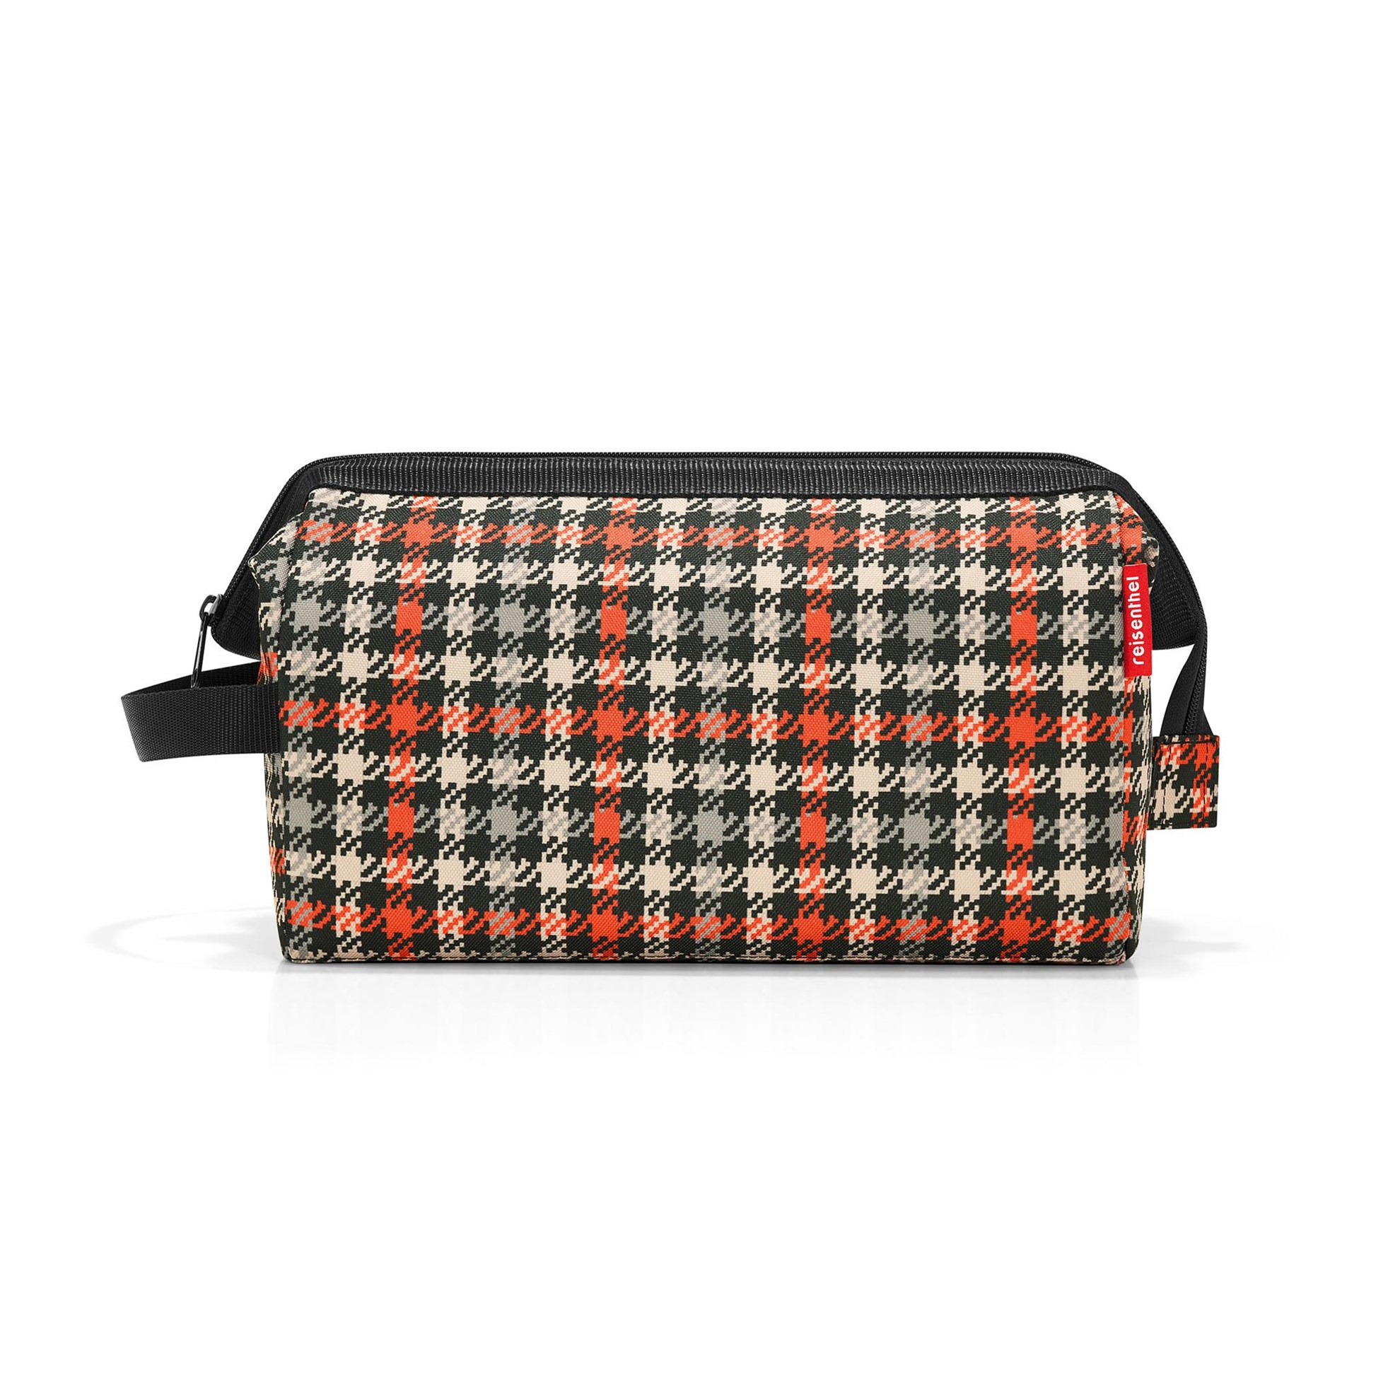 Kosmetická taška TRAVELCOSMETIC XL glencheck red_1